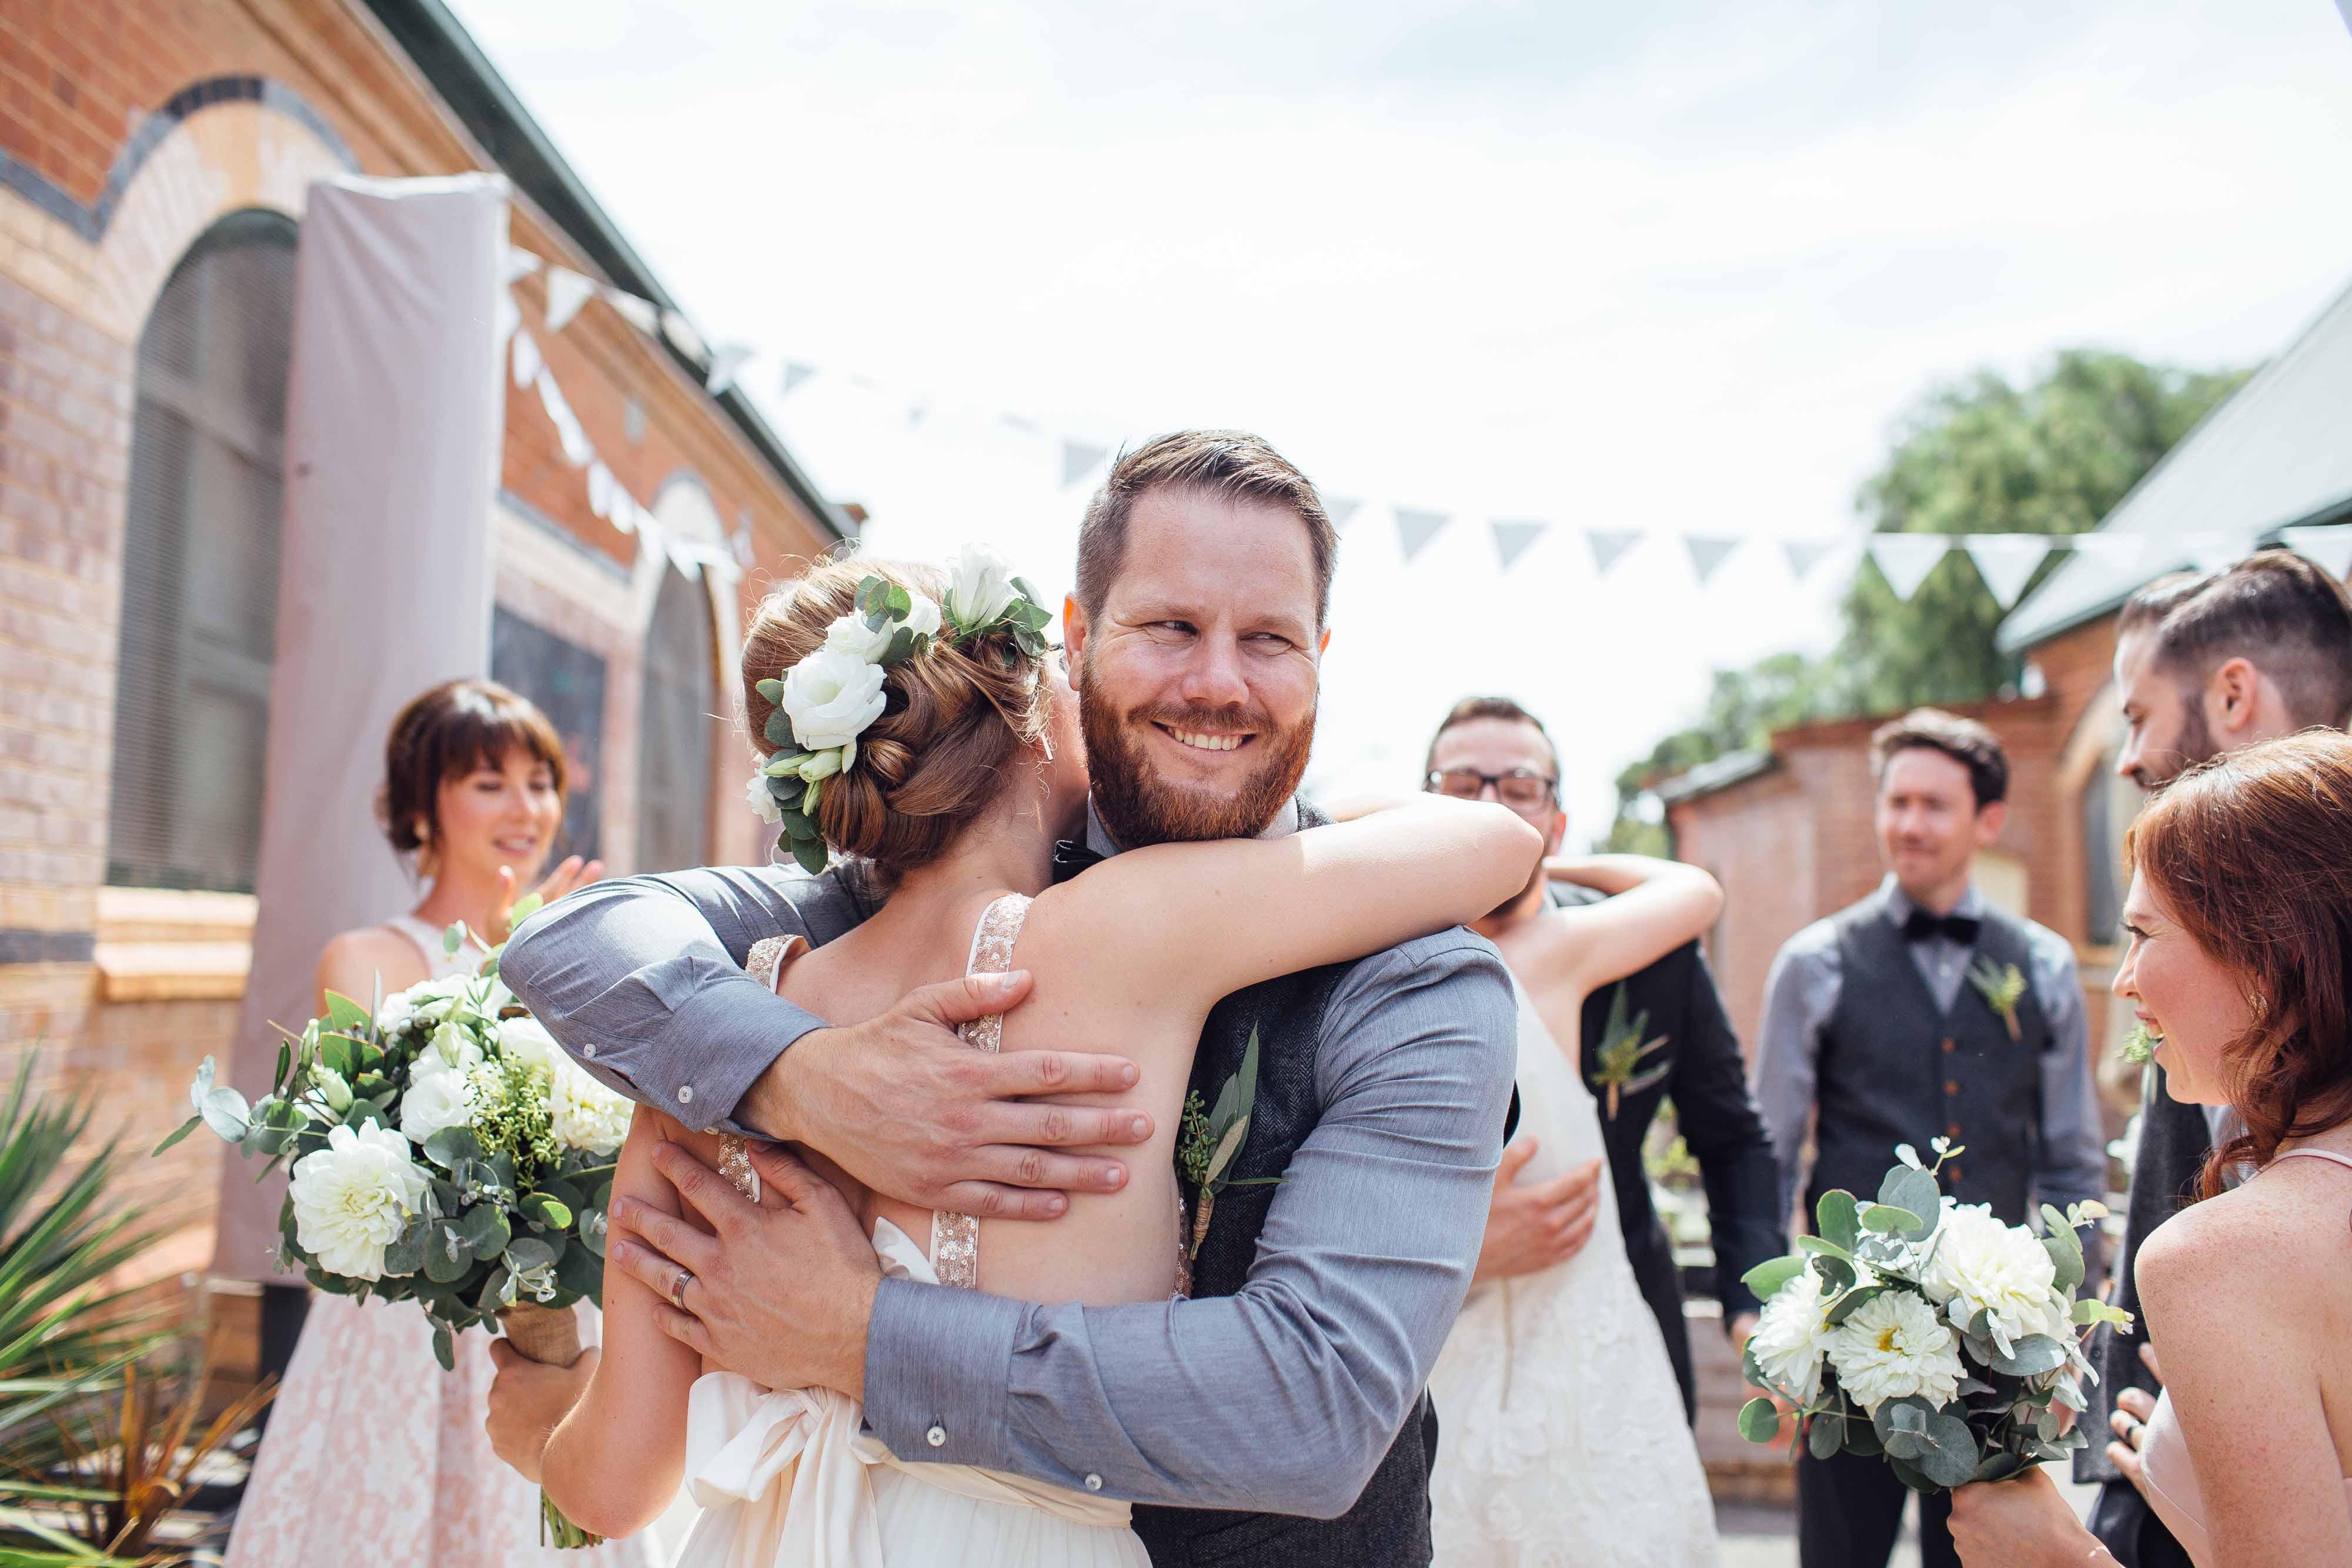 elise&liam-wedding-sonjacphotography-highres-387